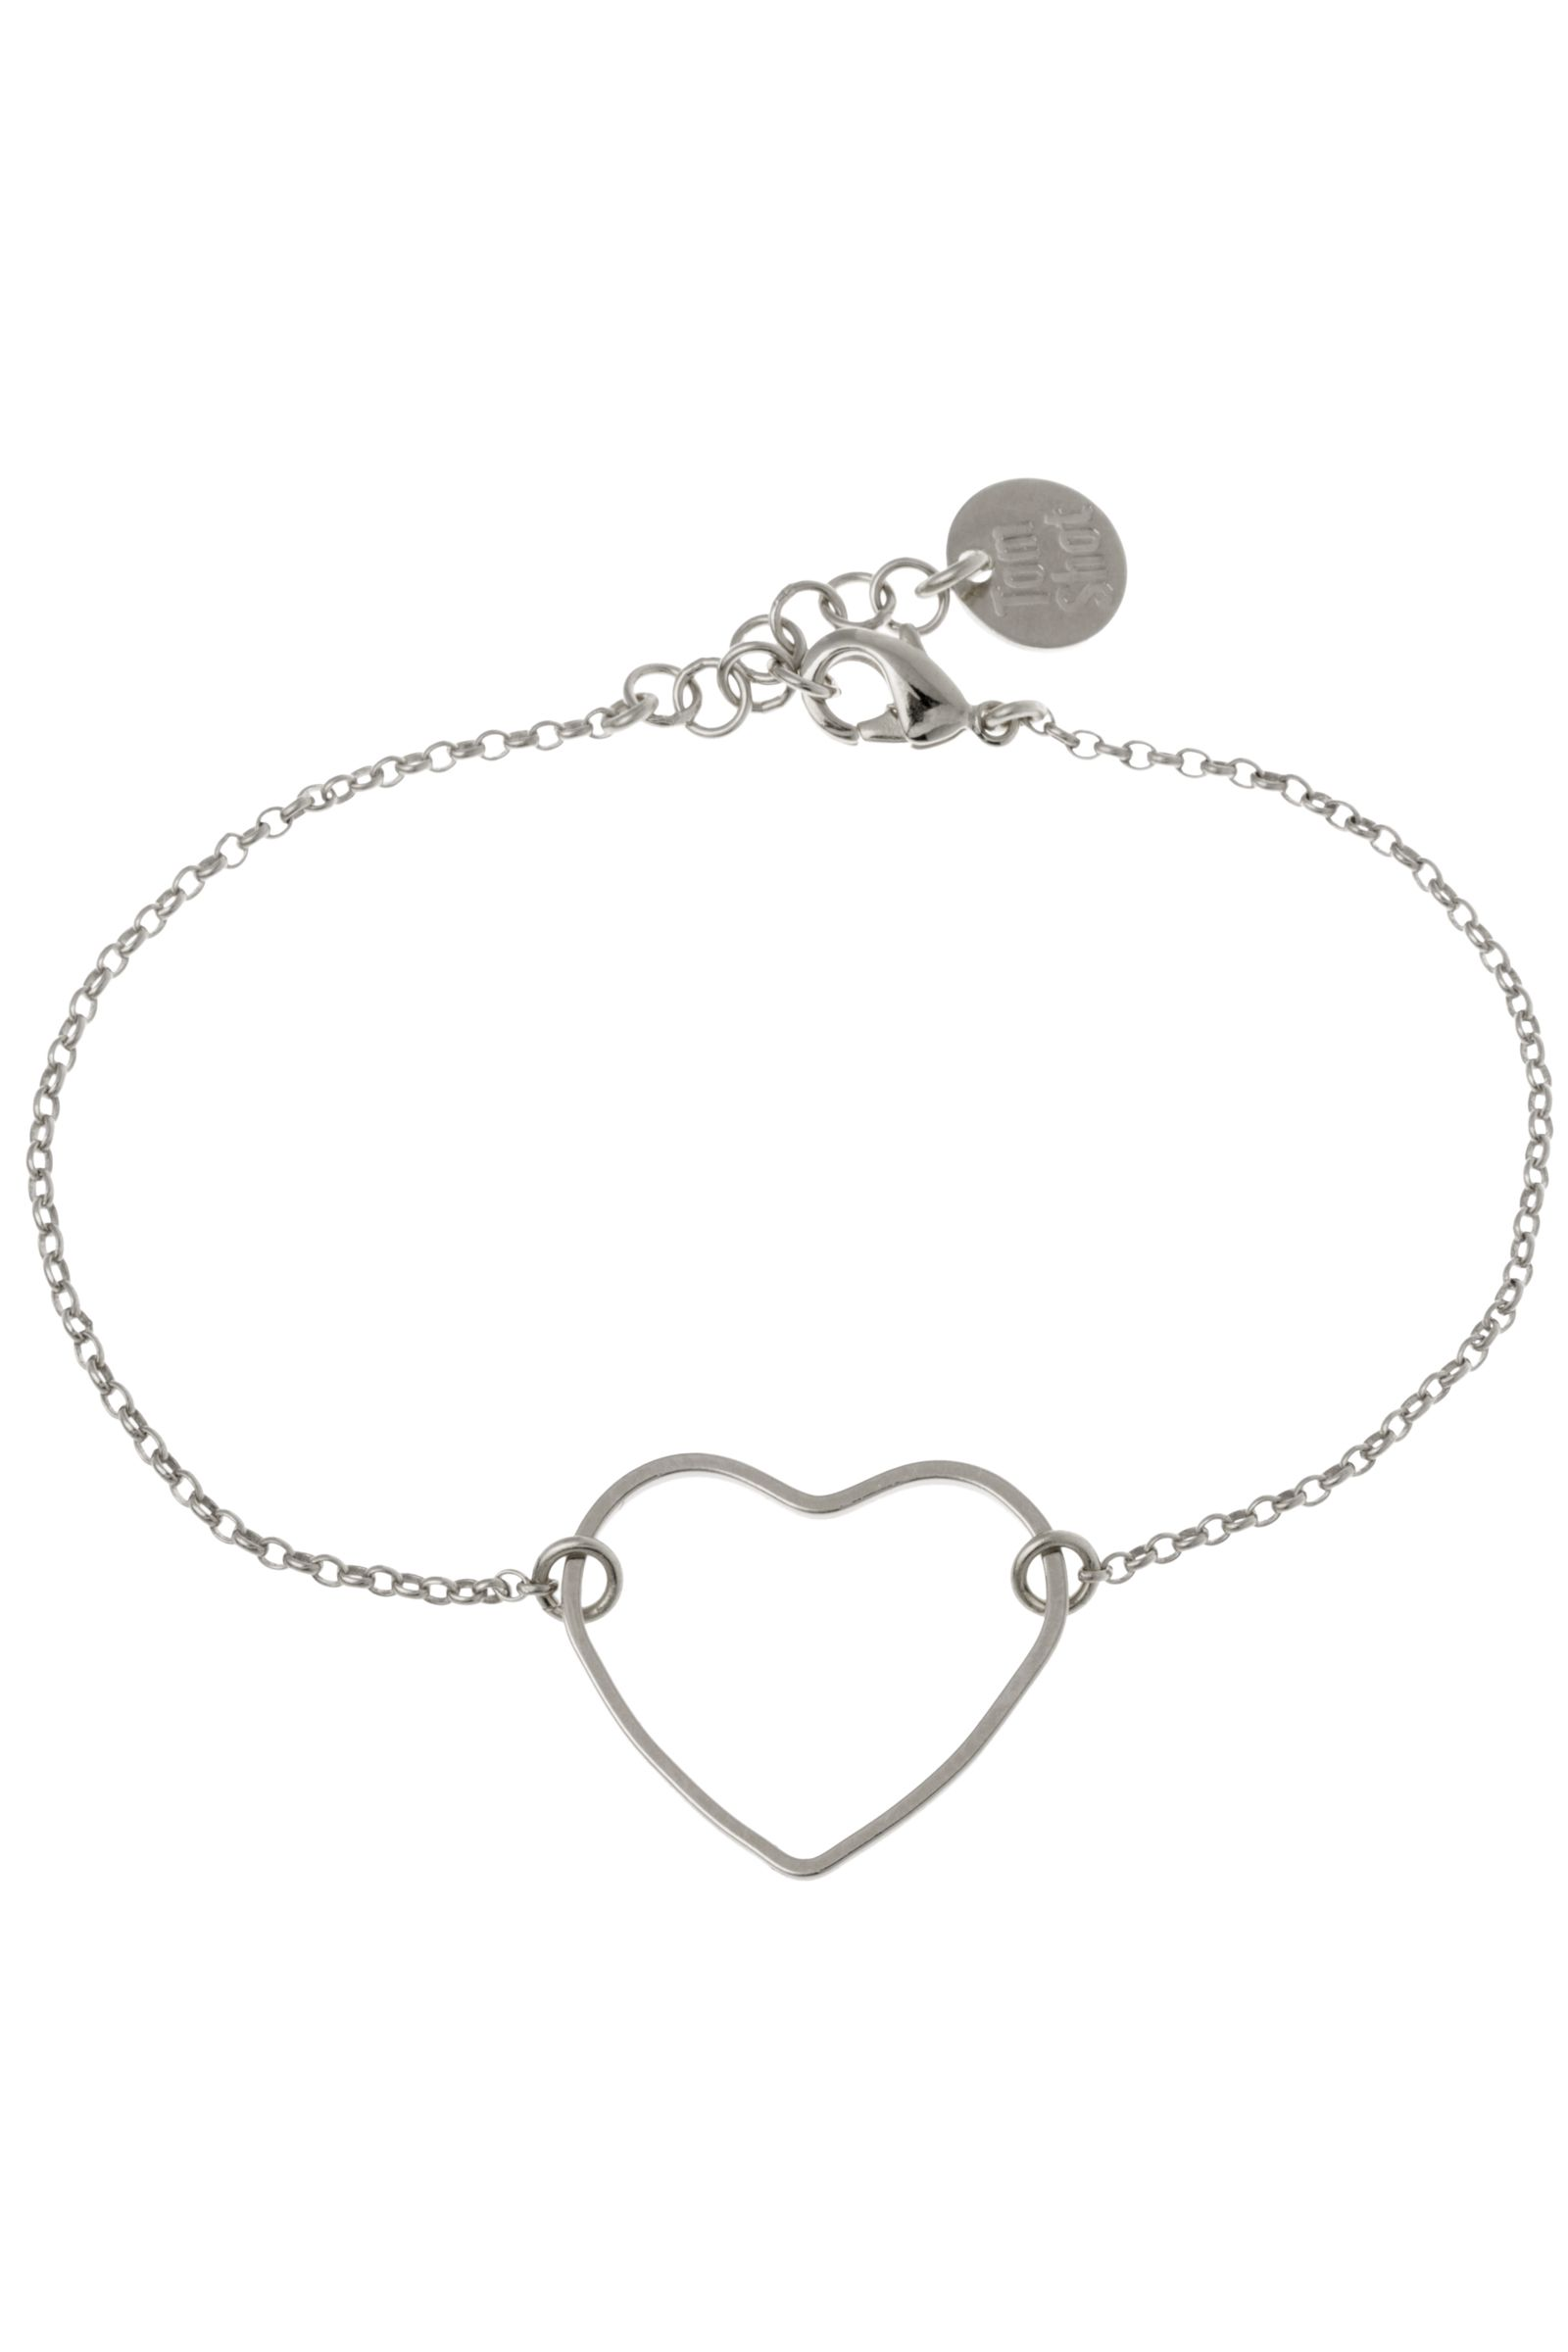 Eternity armband silver